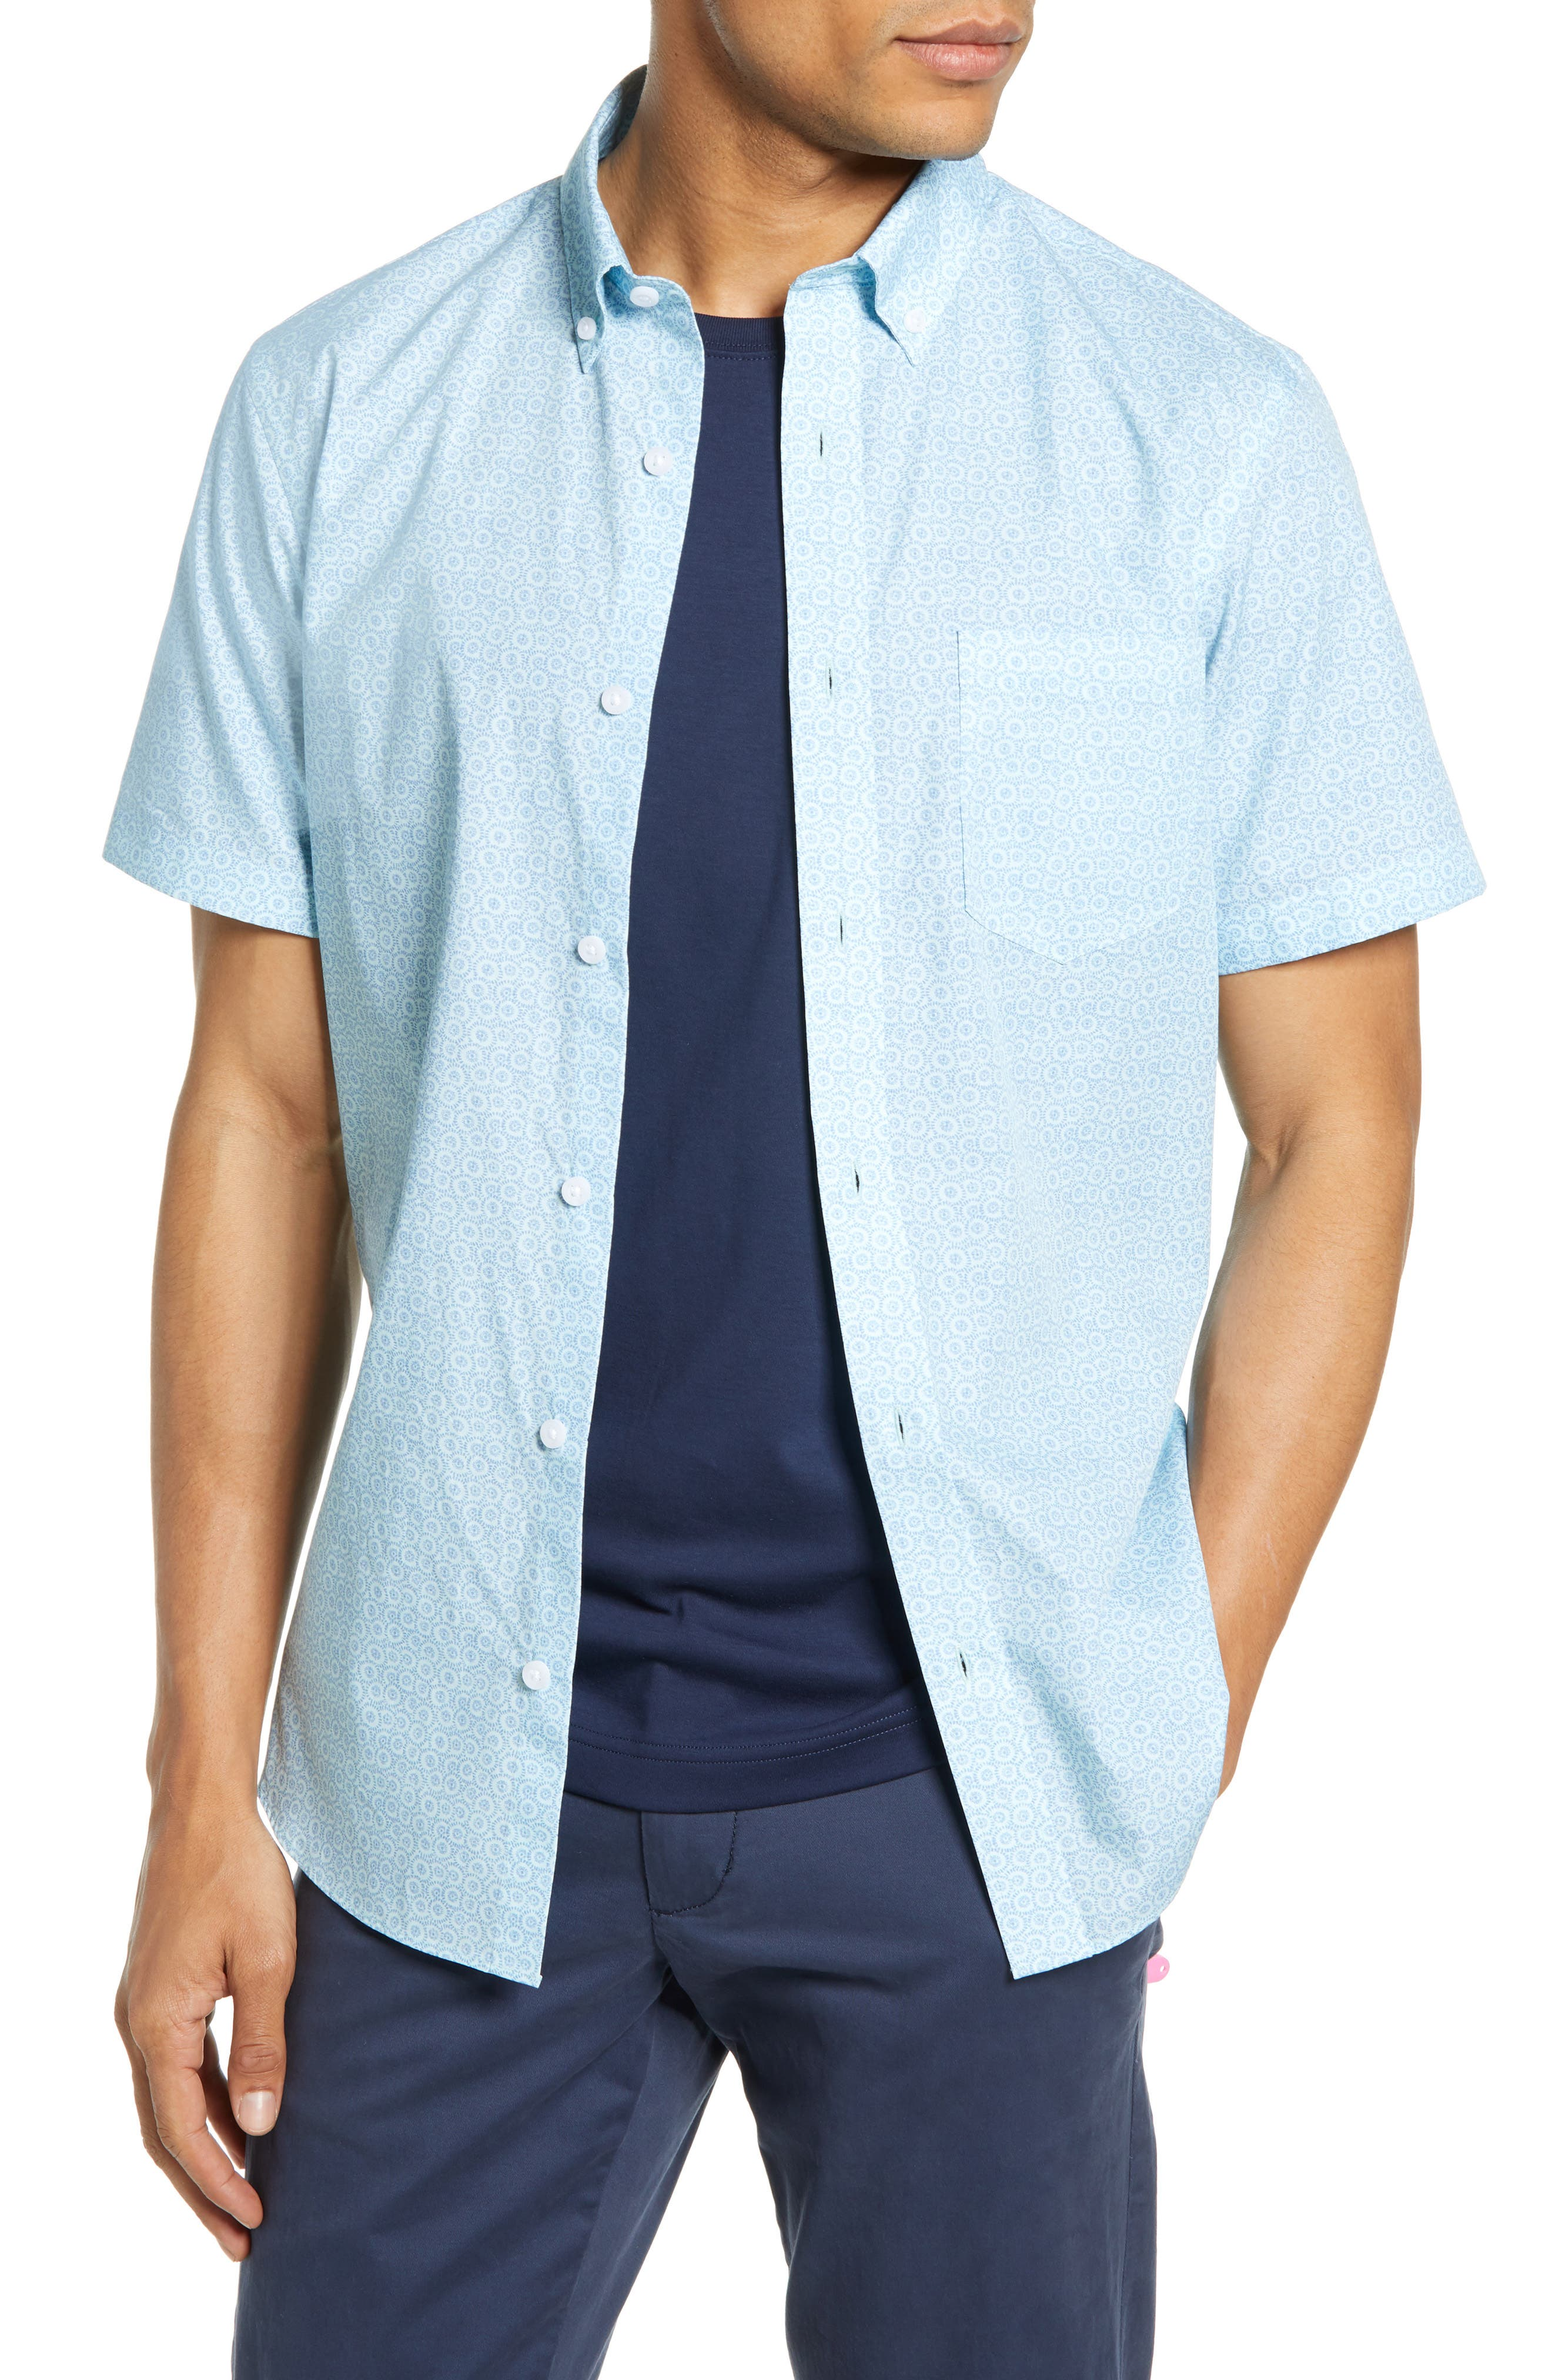 1901 Geometric Print Slim Fit Cotton Sport Shirt